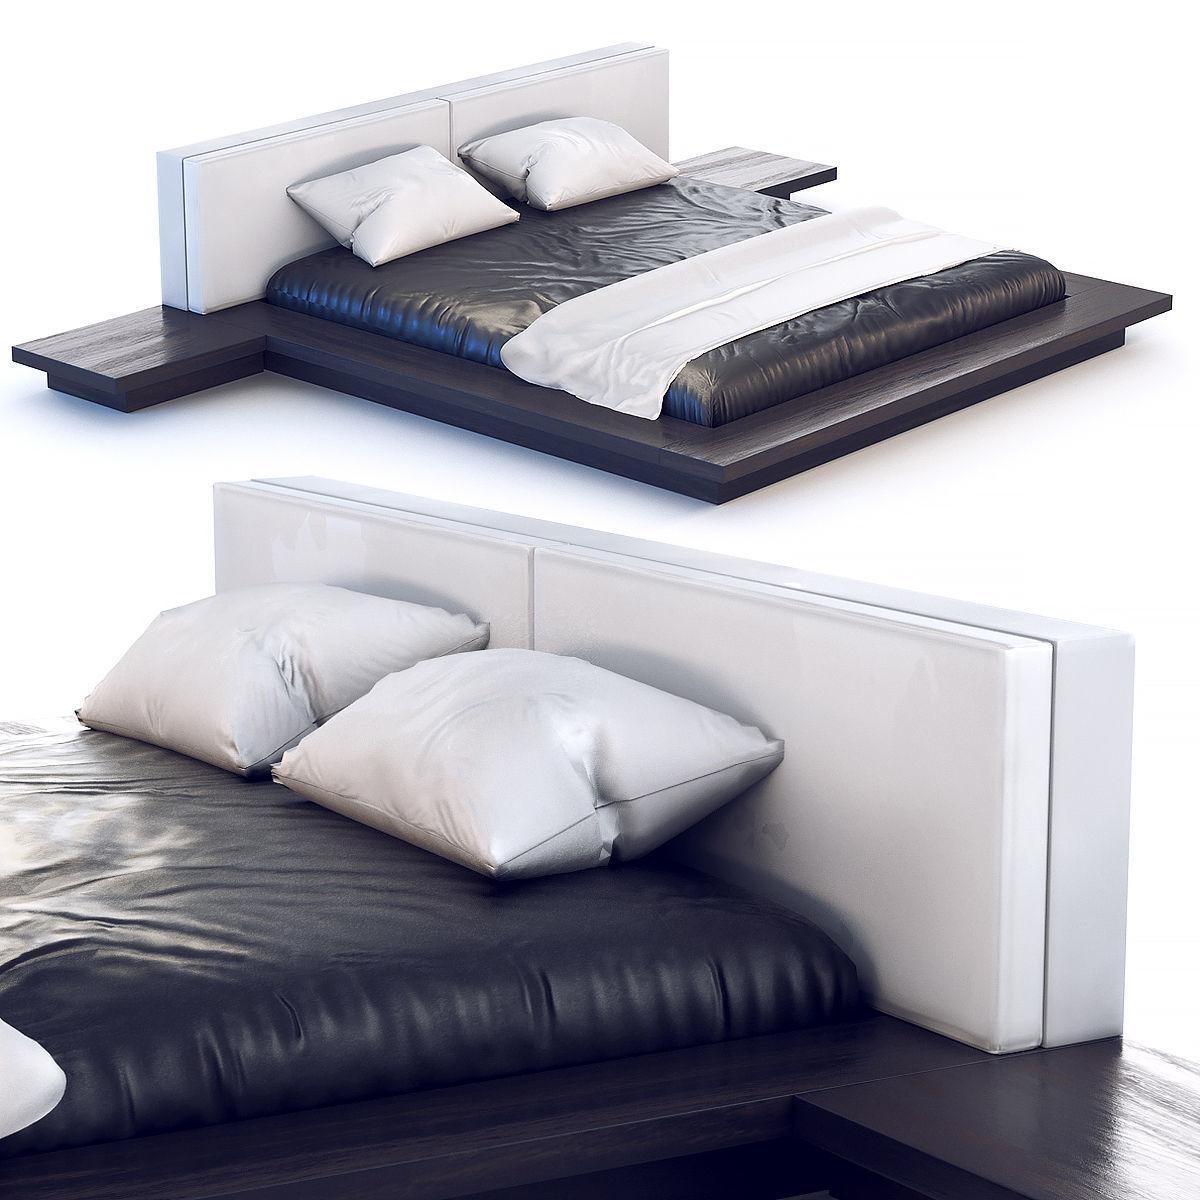 Bed 180 x 200 cm in dark wood